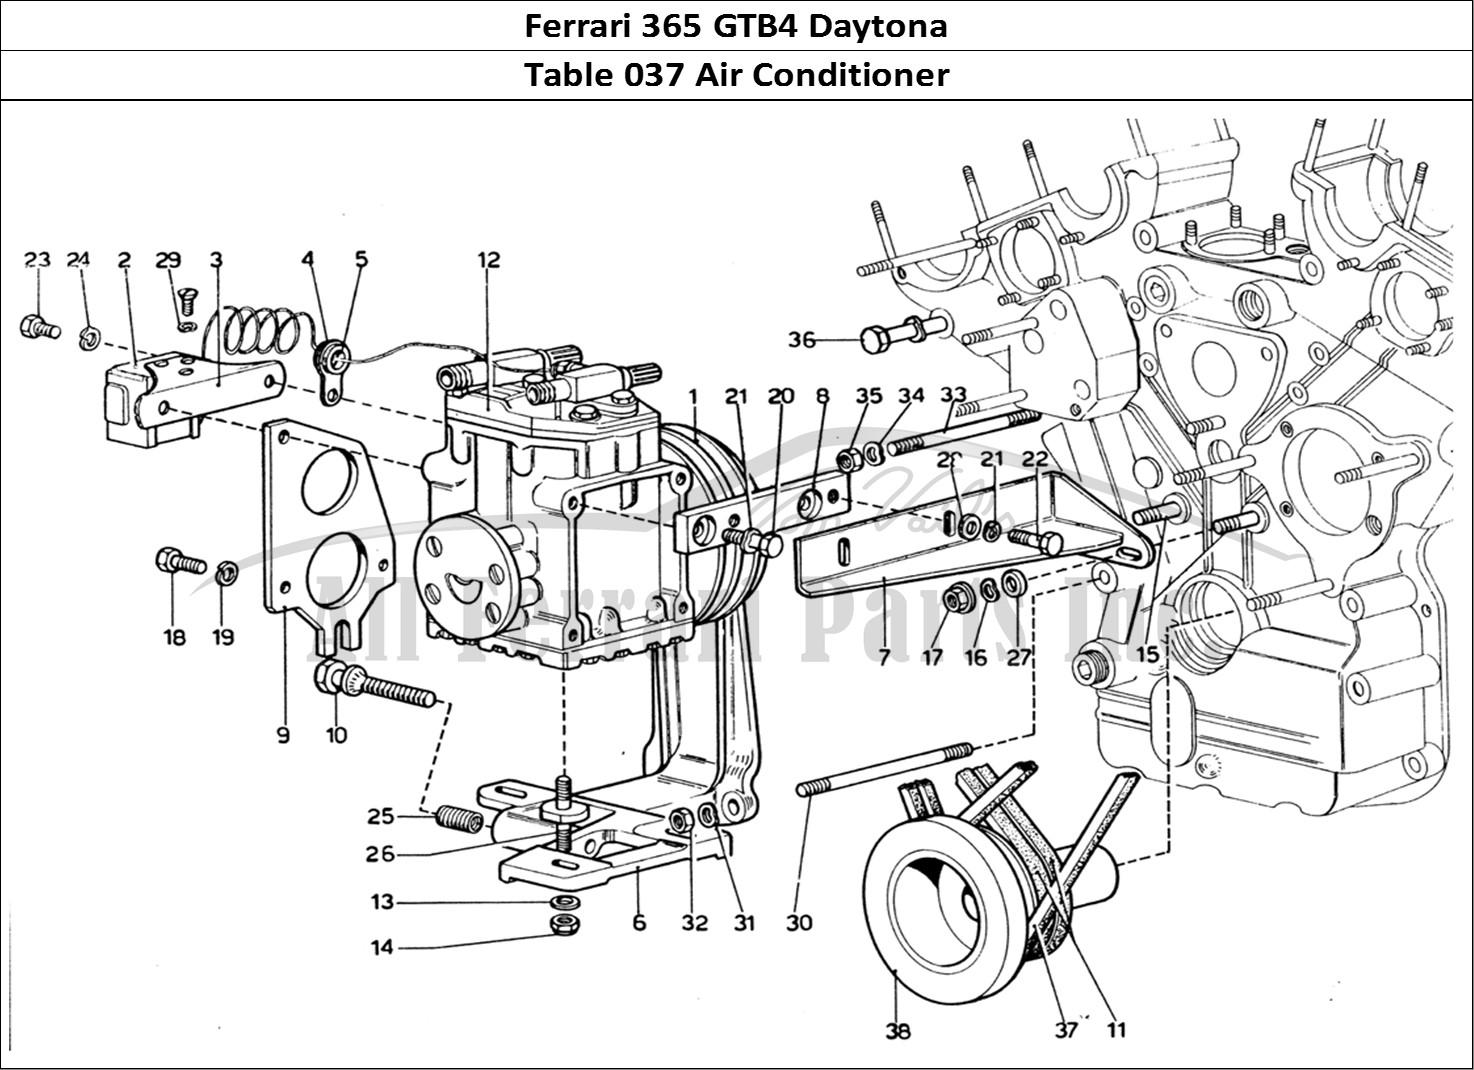 Buy Original Ferrari 365 Gtb4 Daytona 037 Air Conditioner